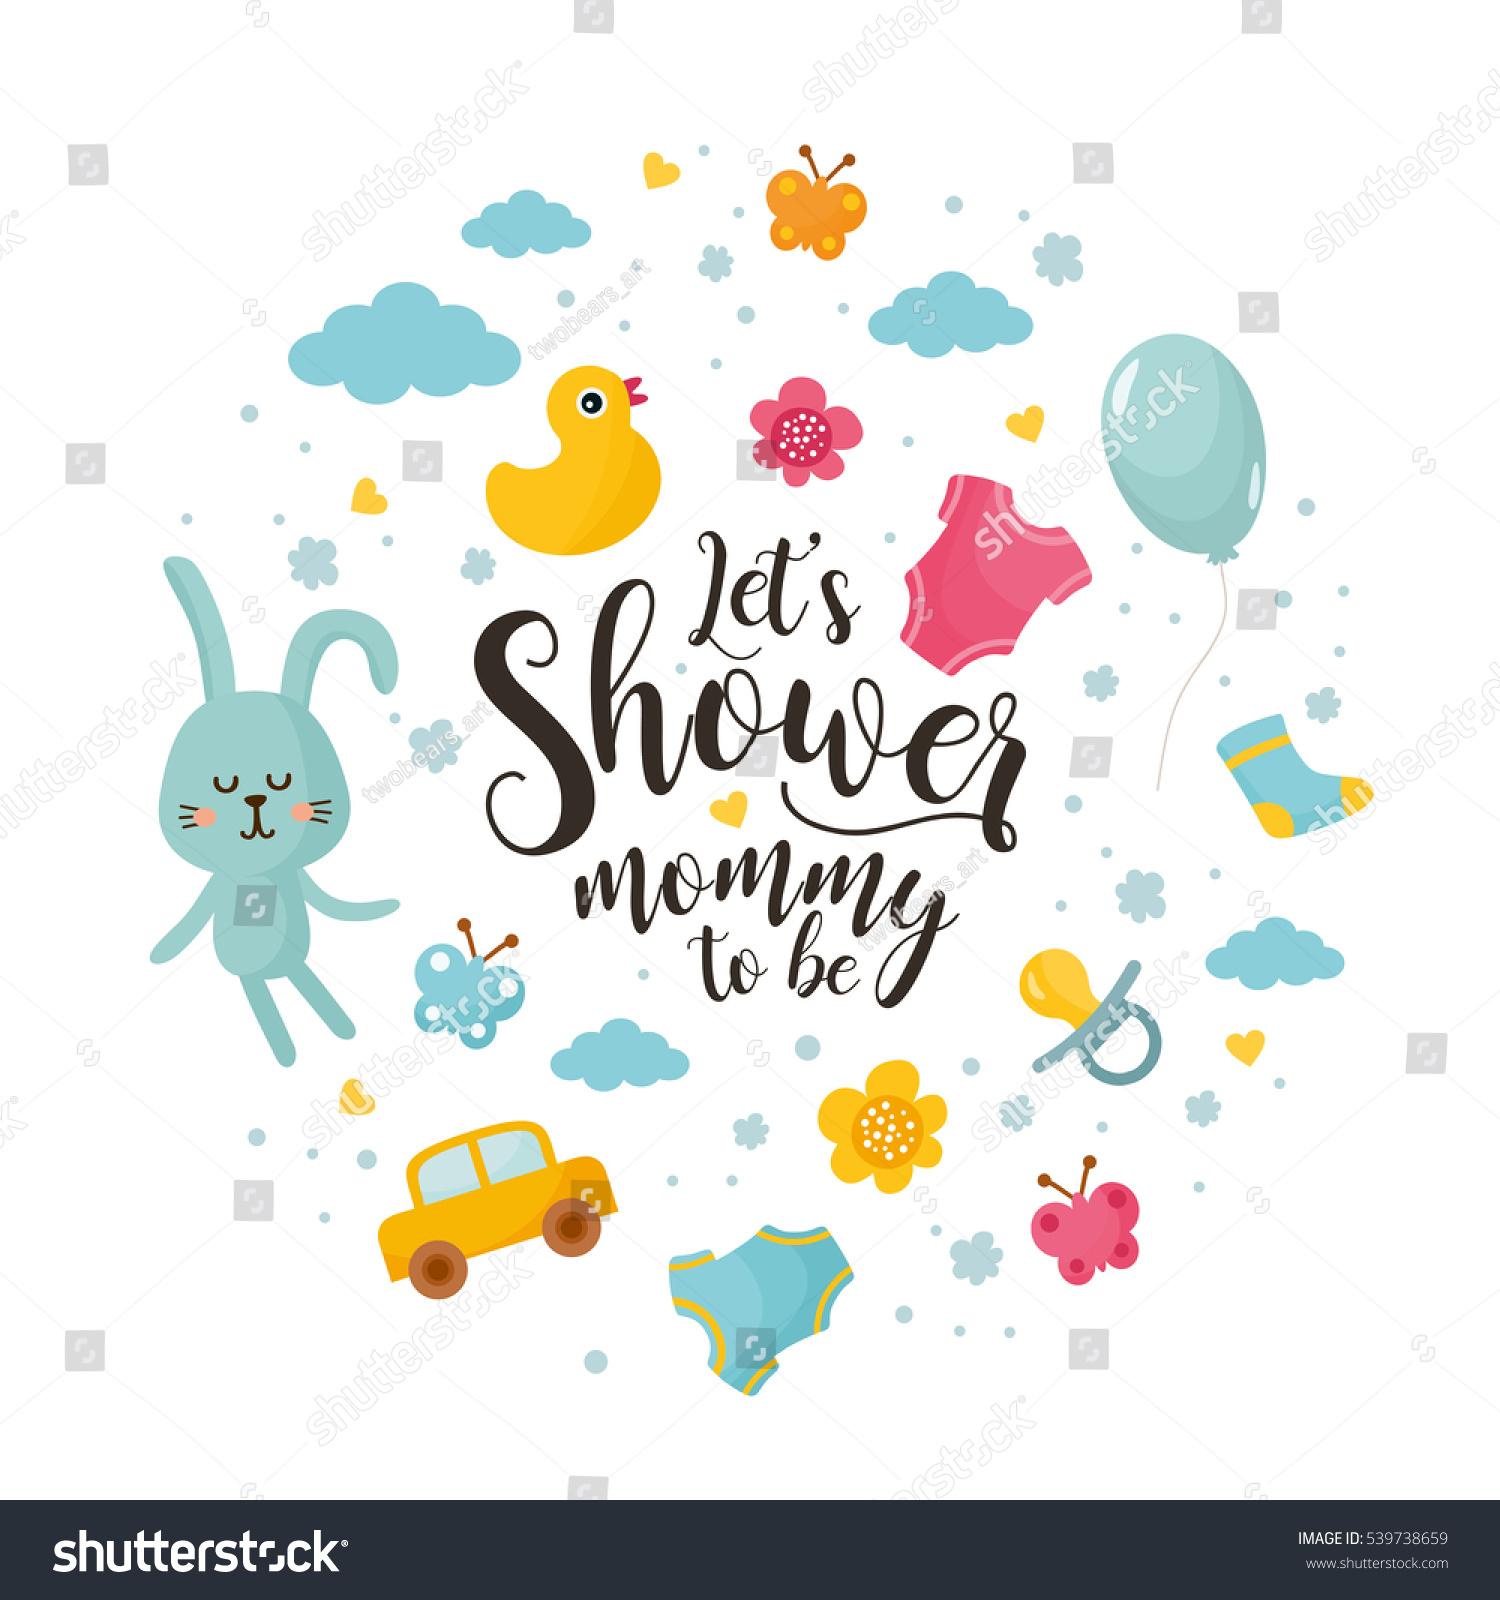 baby shower concept lets shower mommy stock vector 539738659 shutterstock. Black Bedroom Furniture Sets. Home Design Ideas